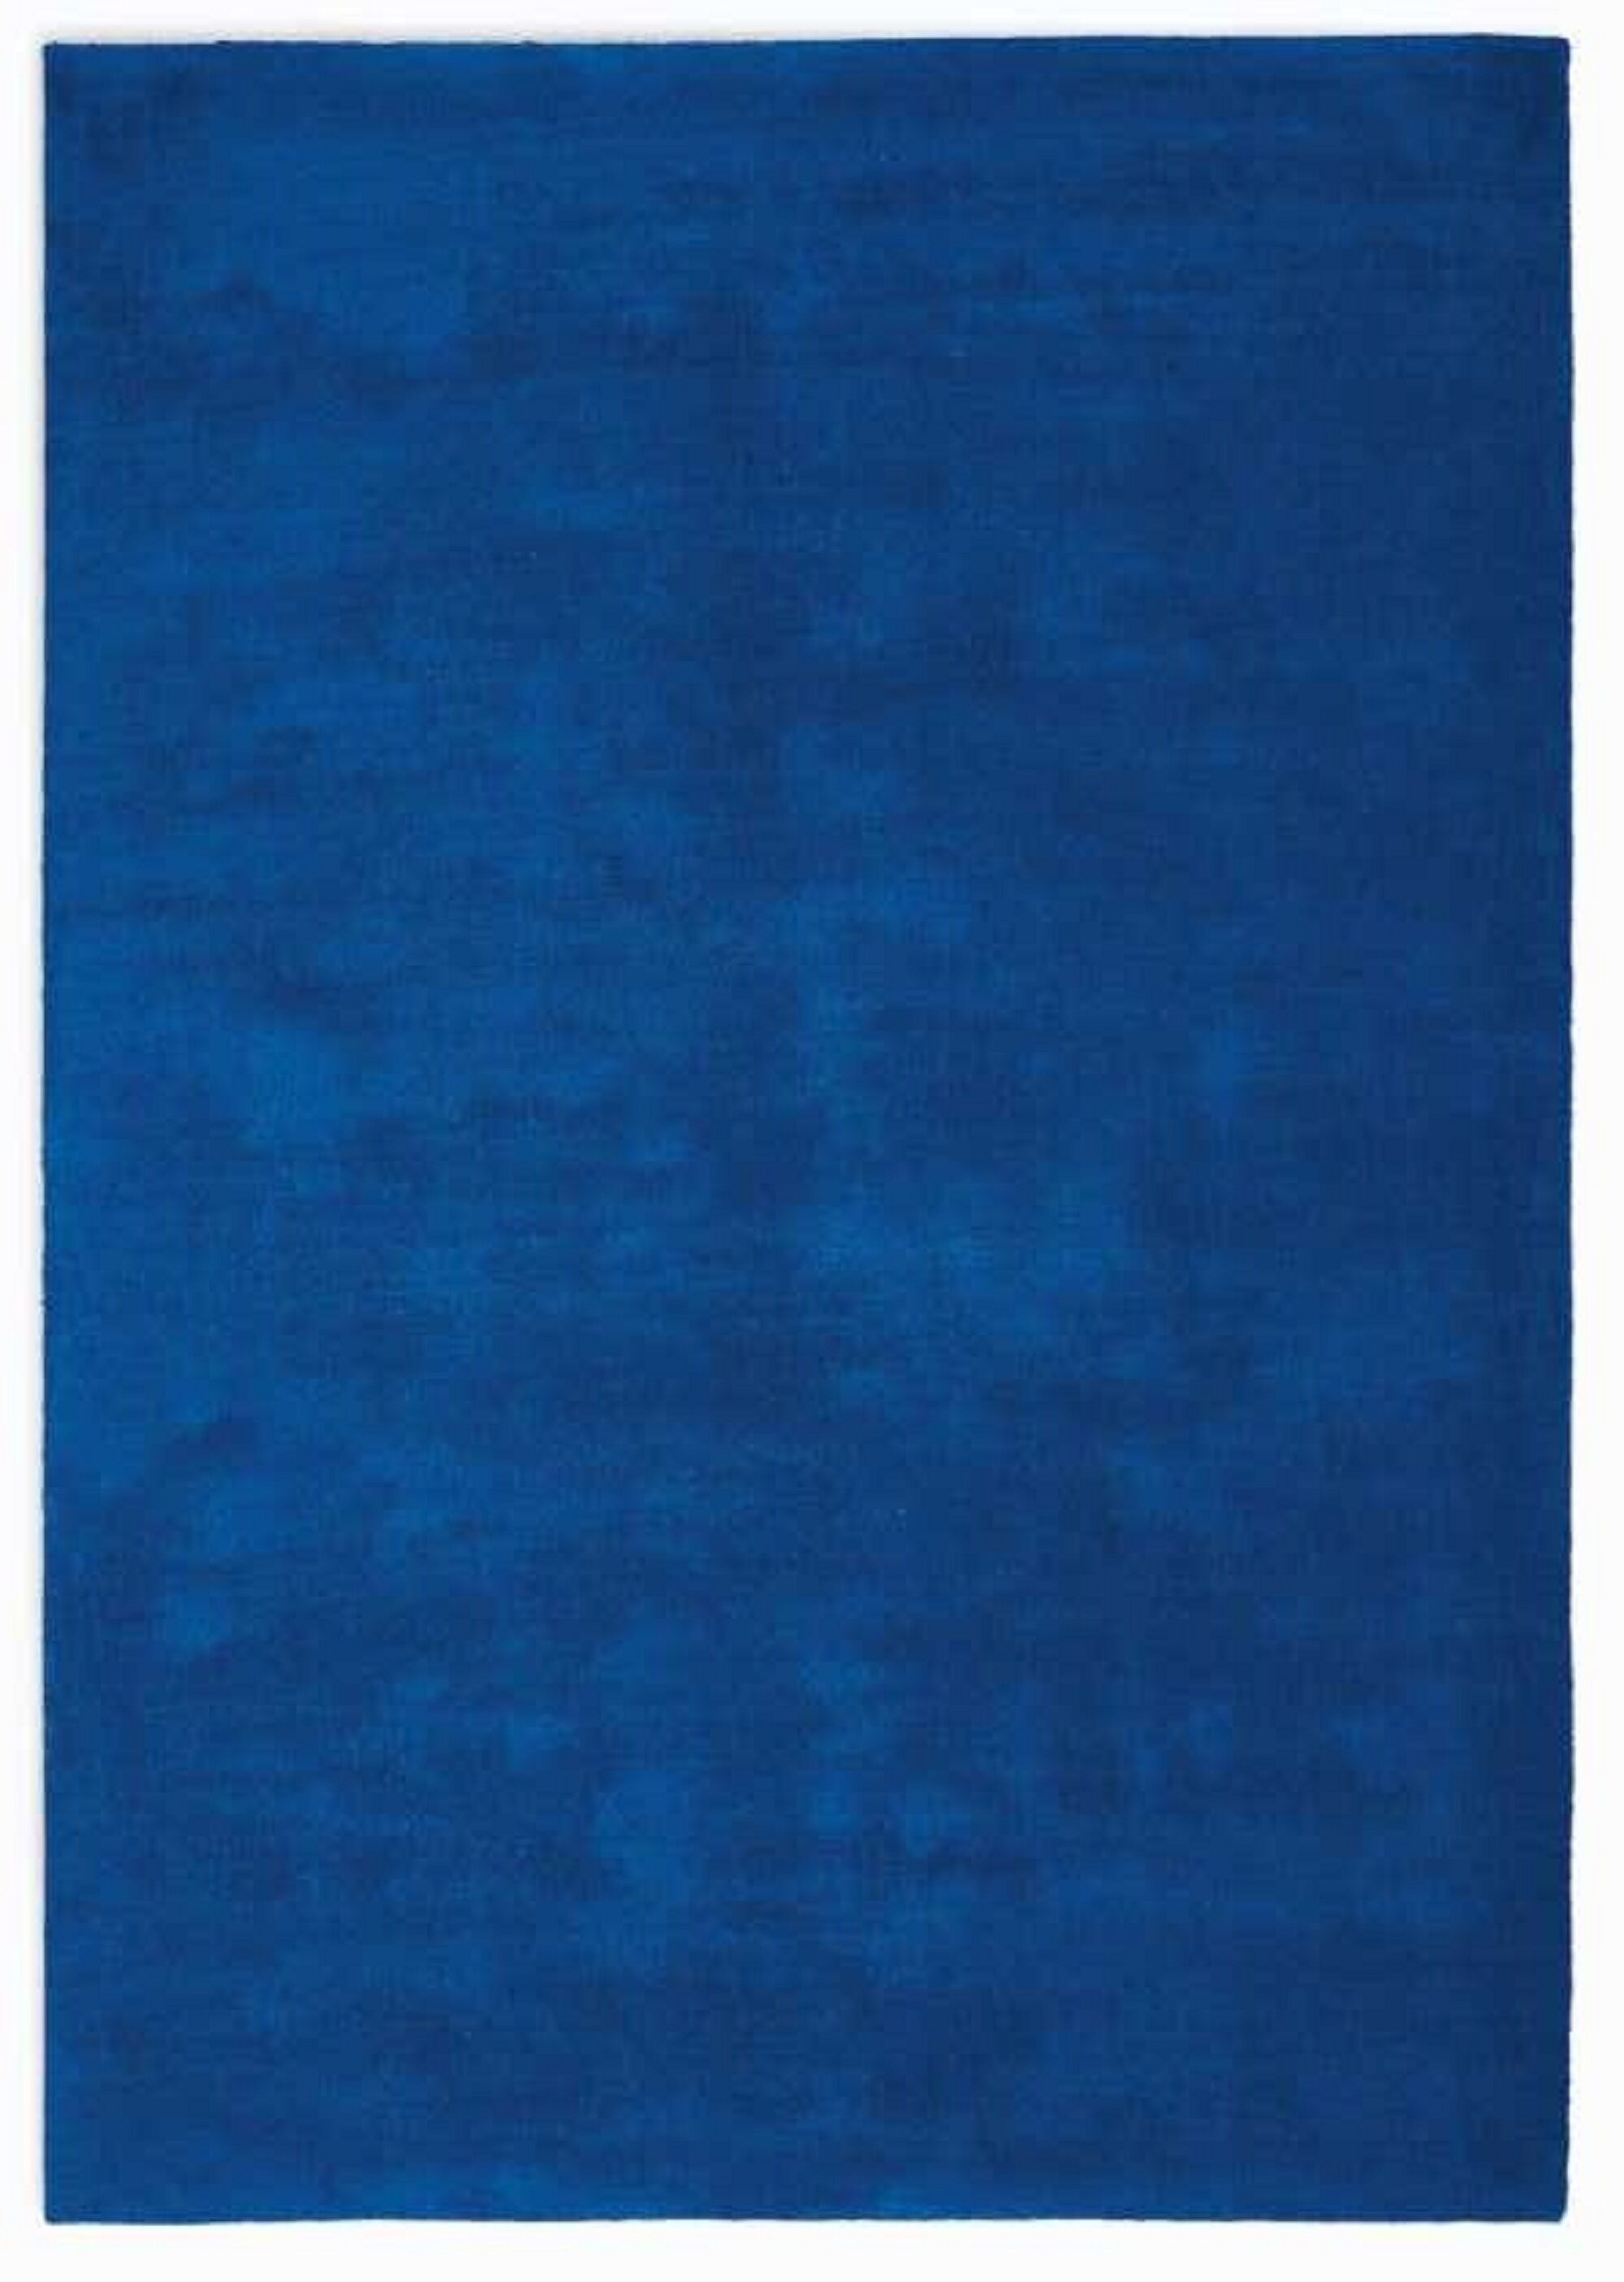 LA Hand-Woven Cobalt Blue Area Rug Rug Size: Rectangle 5'3